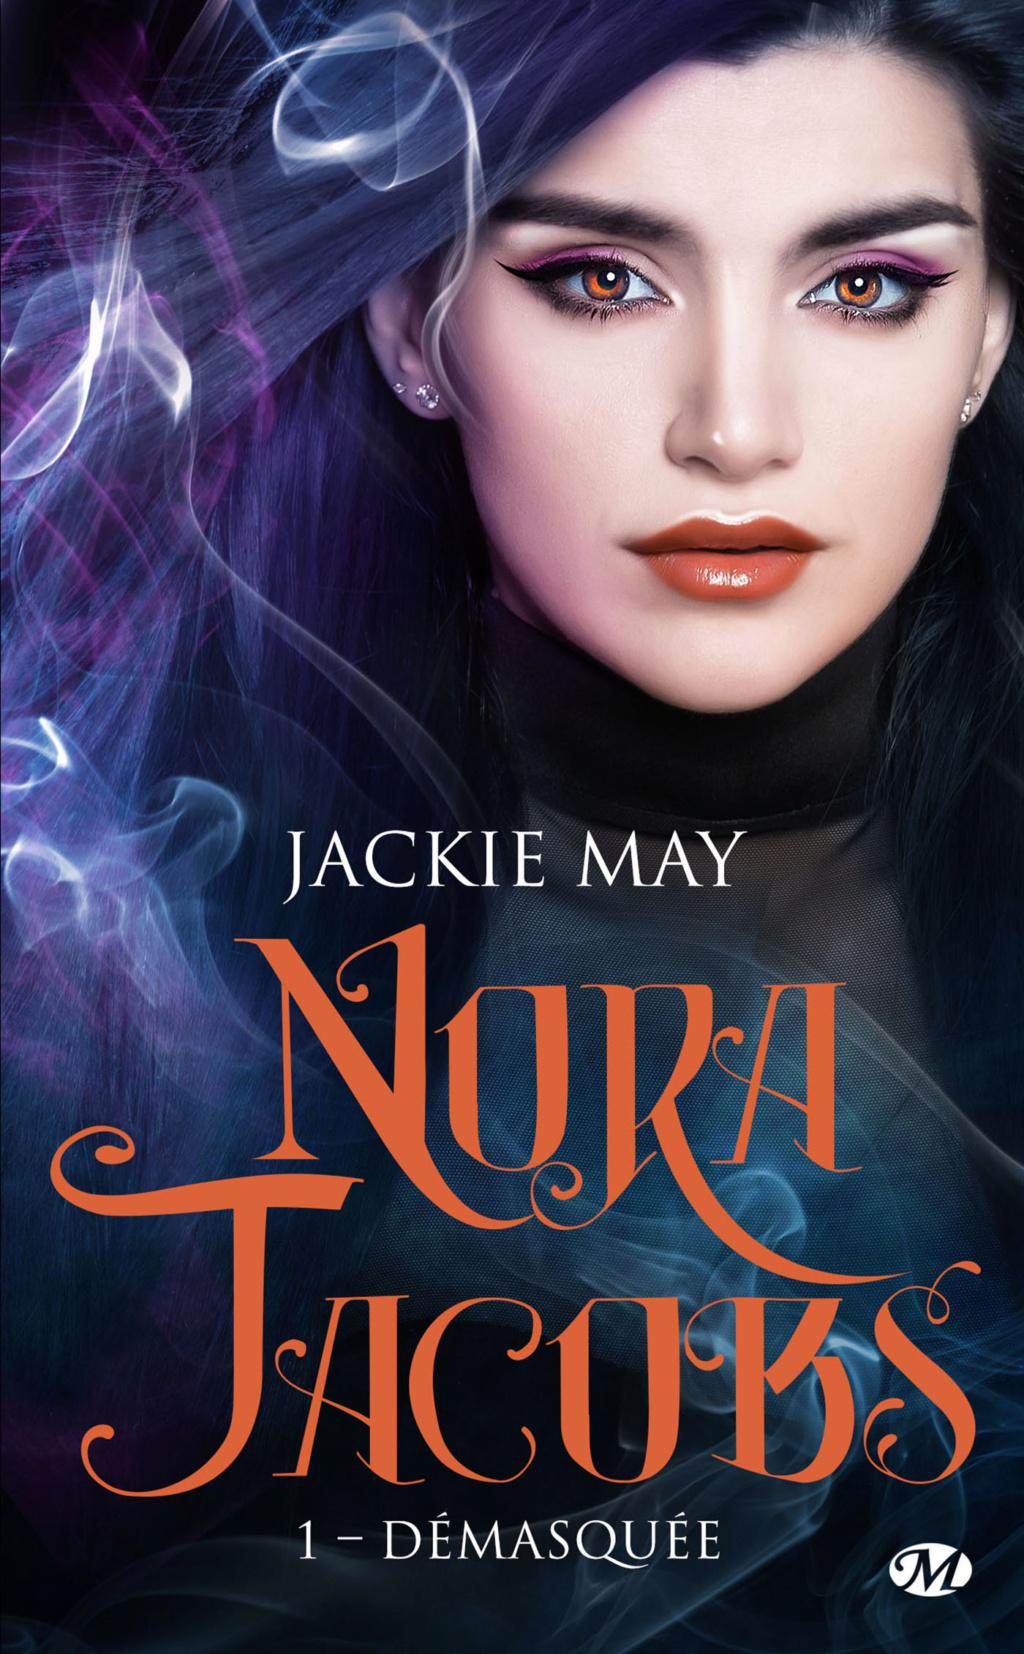 Nora Jacobs - Tome 1 : Démasquée de Jackie May Nora-j10